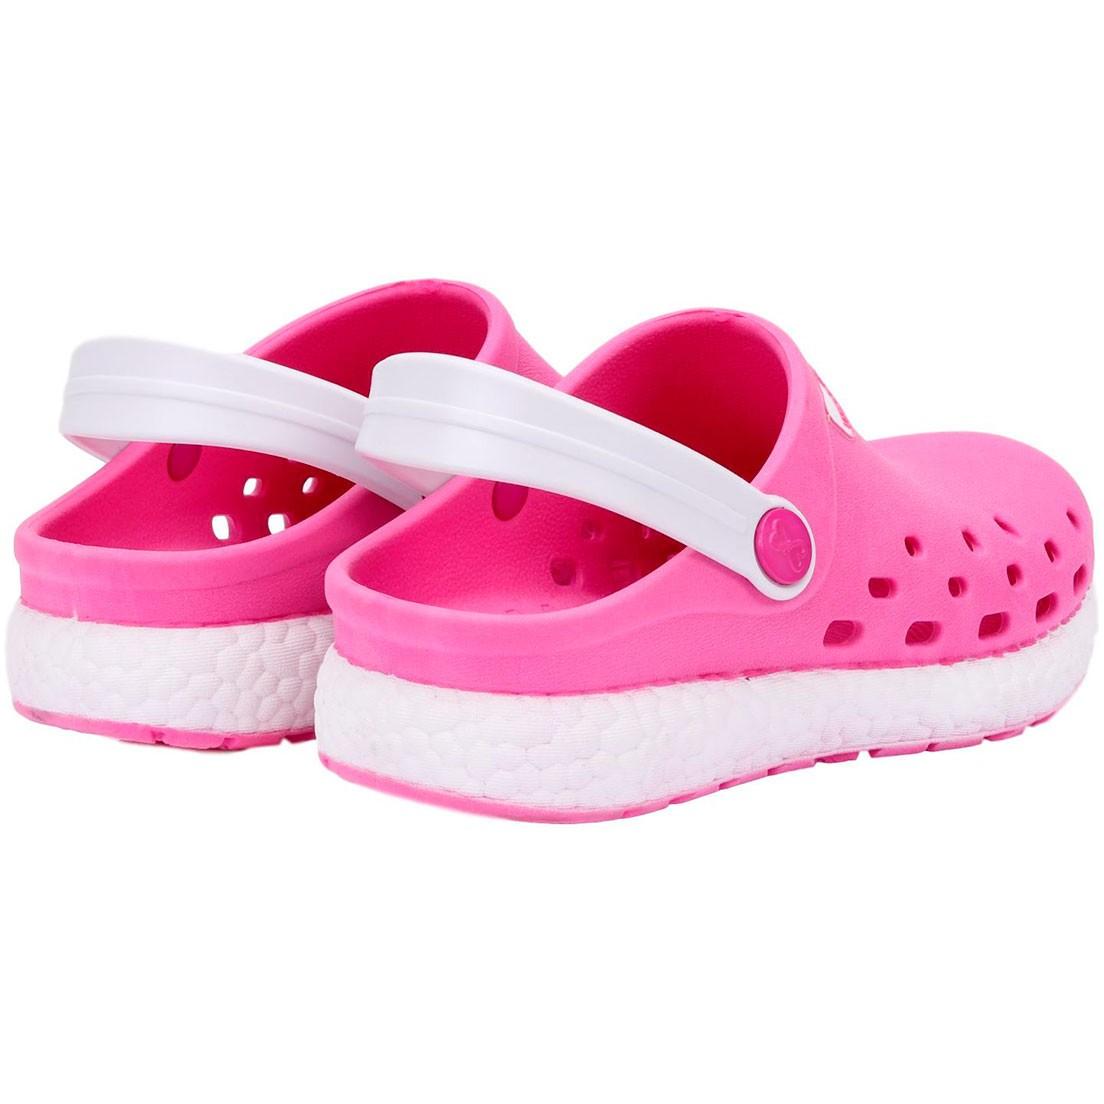 Babuche World Colors Pink/Branco Feminino 129.0021507